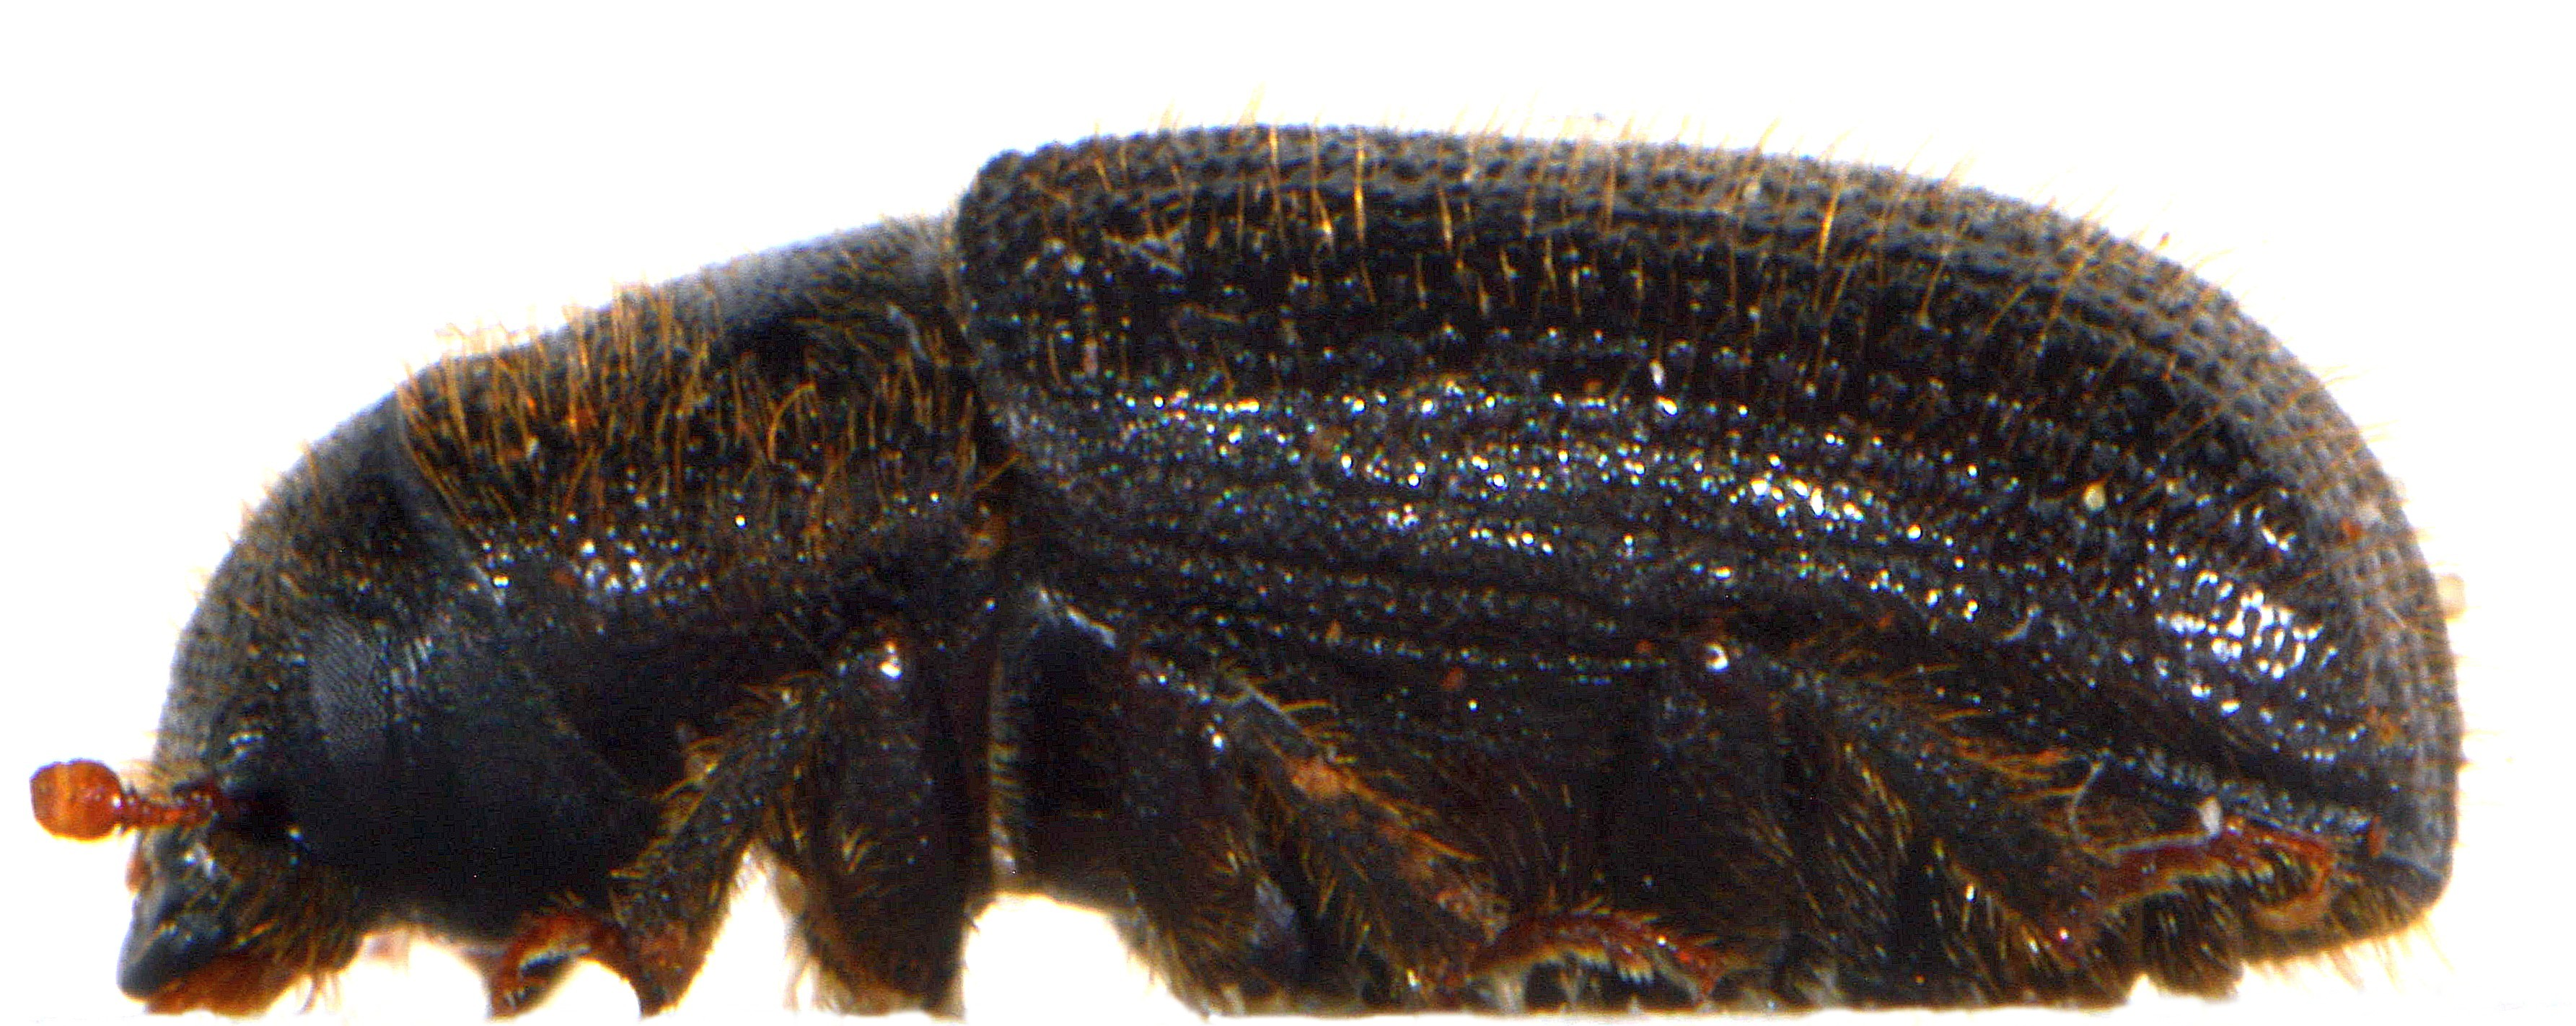 Dendroctonus micans 2